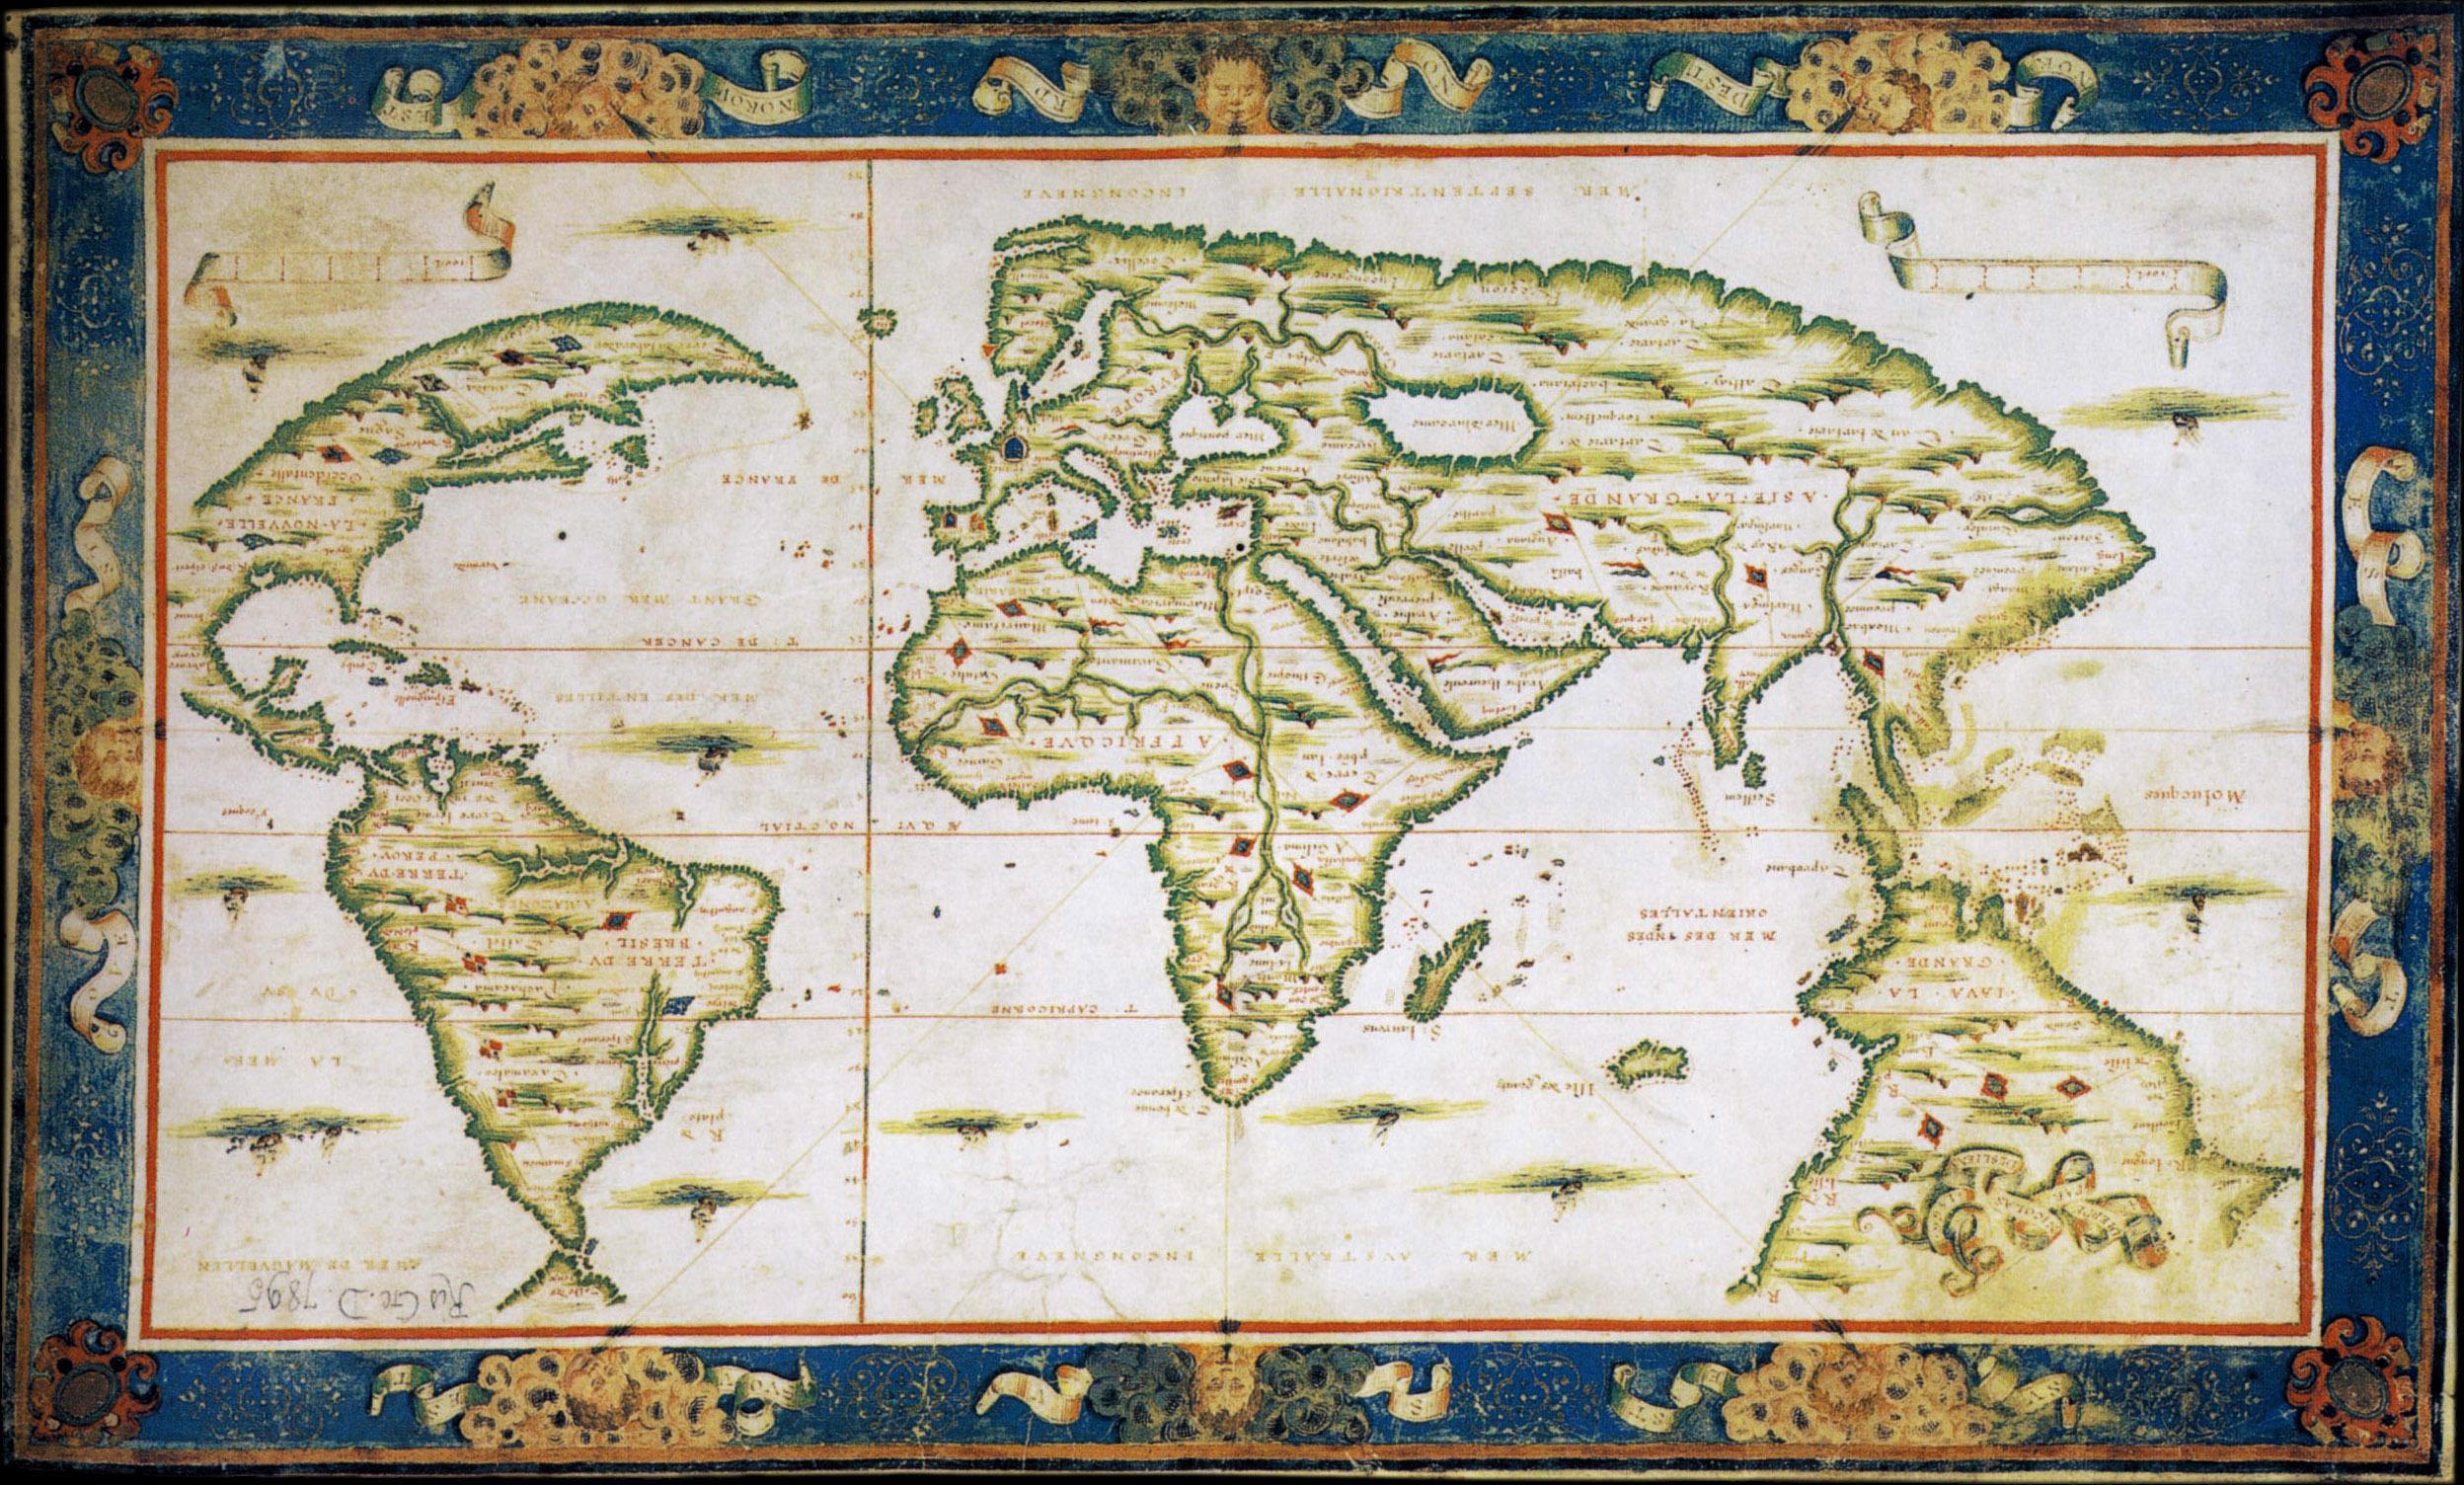 Java La Grande Musings on Maps